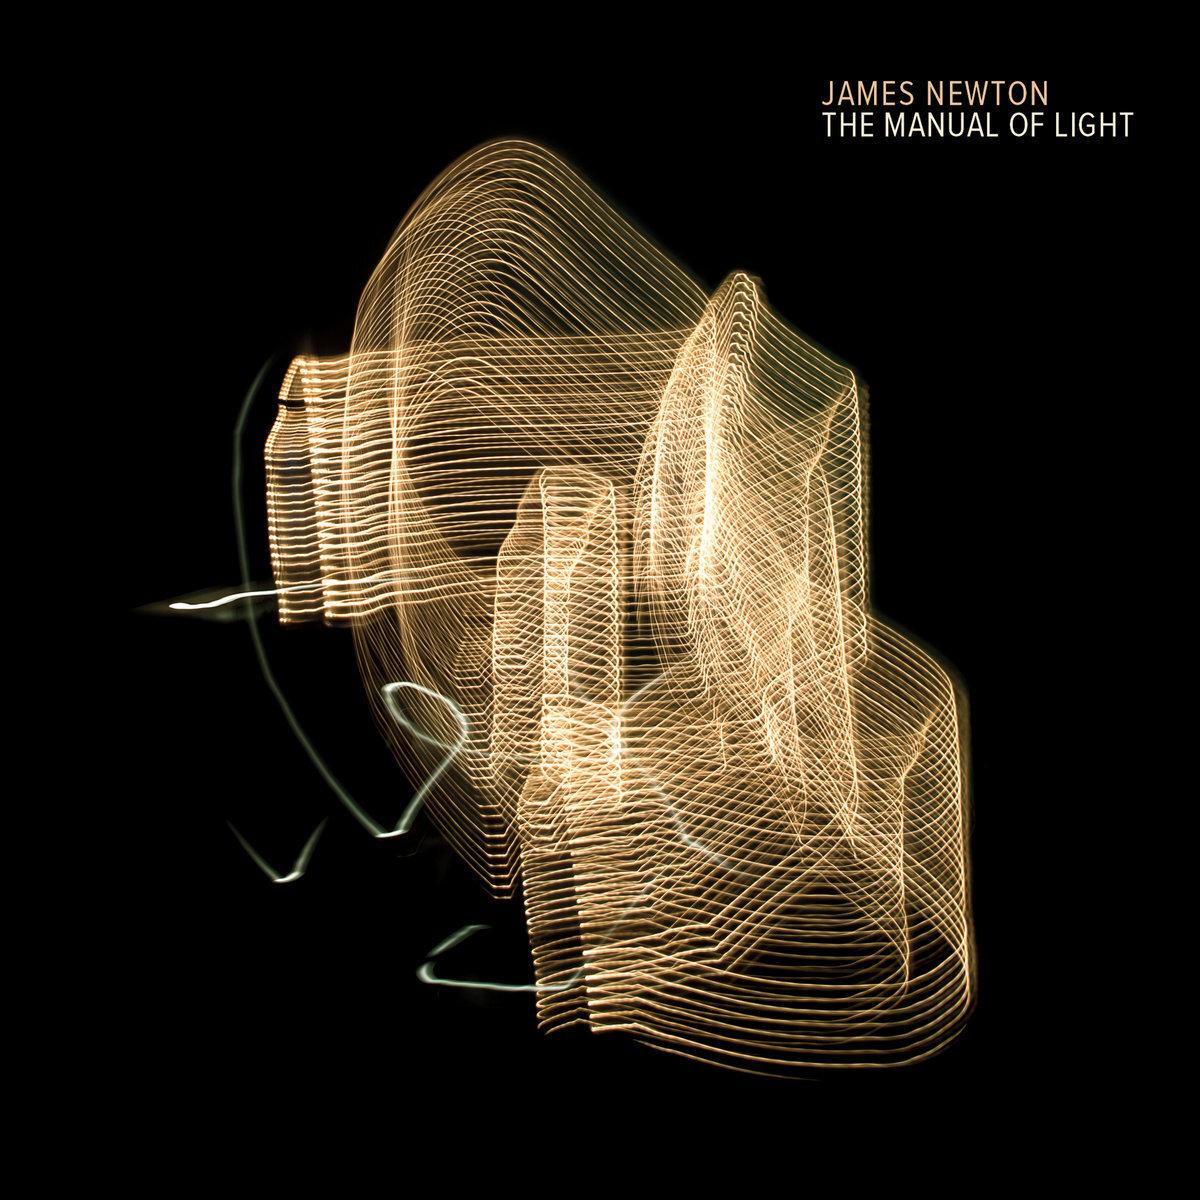 James Newton // The Manual of Light